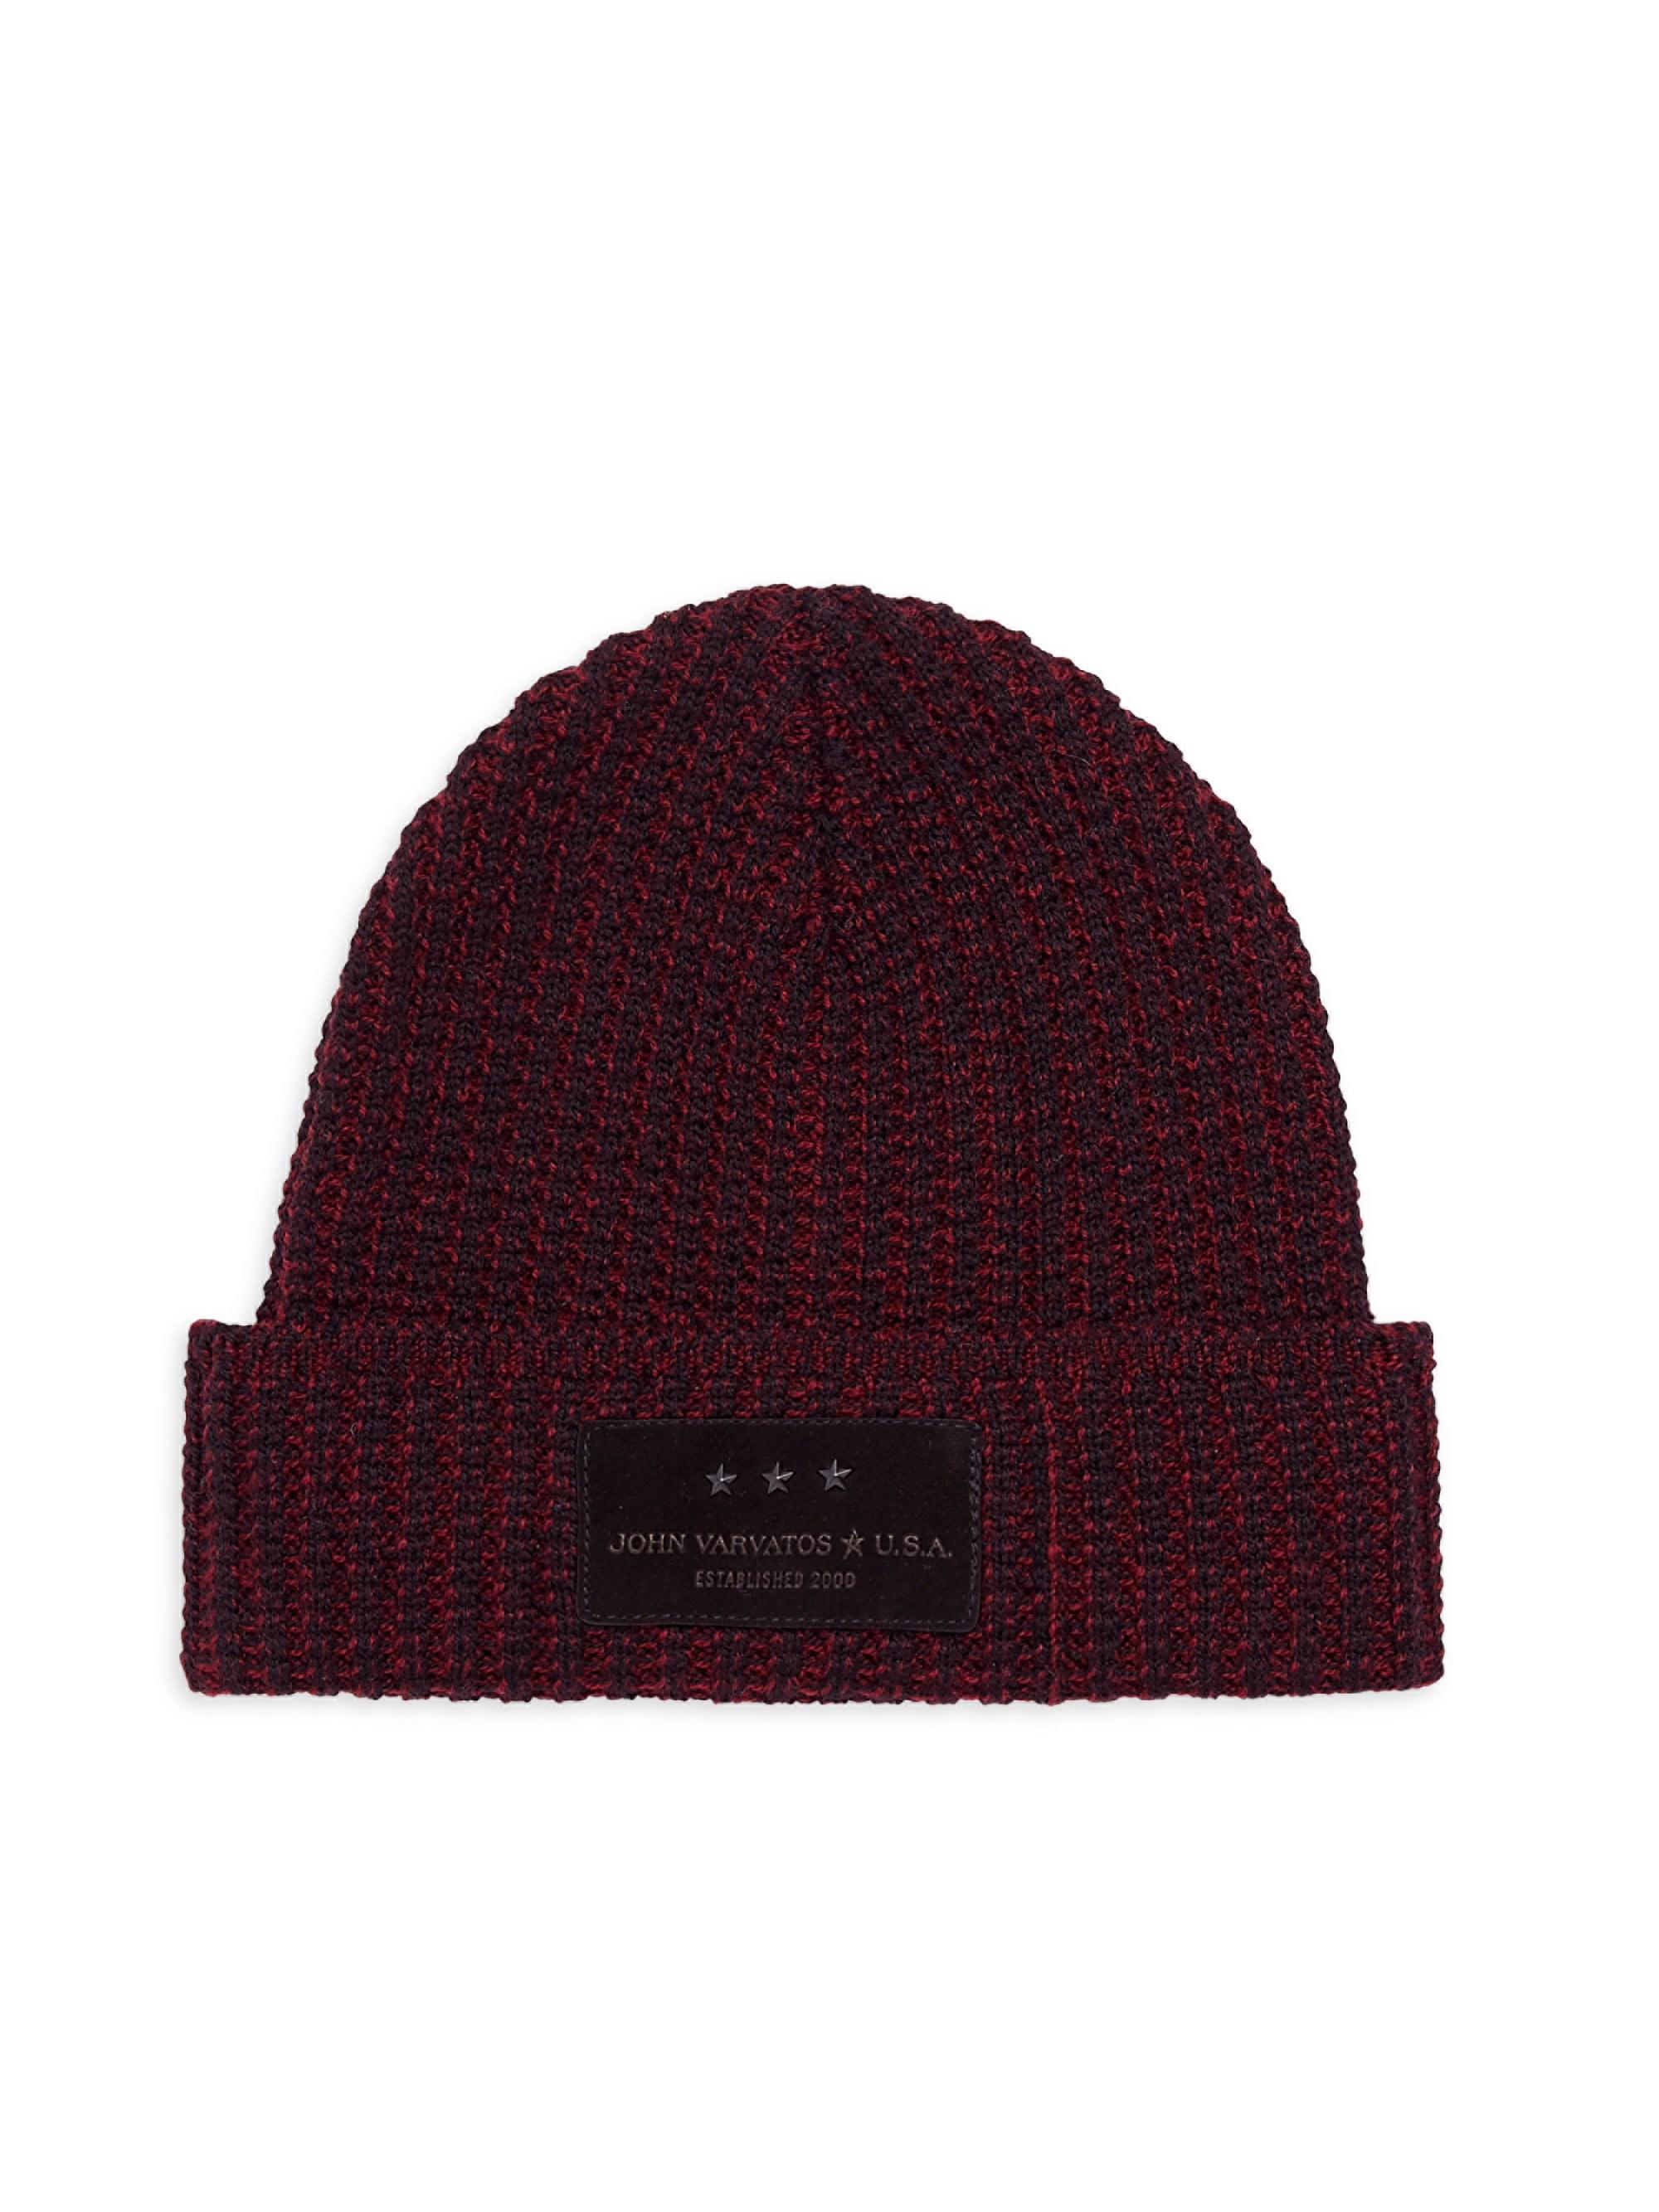 John Varvatos Merino Wool Knit Hat in Purple for Men - Lyst 2672f034c93d